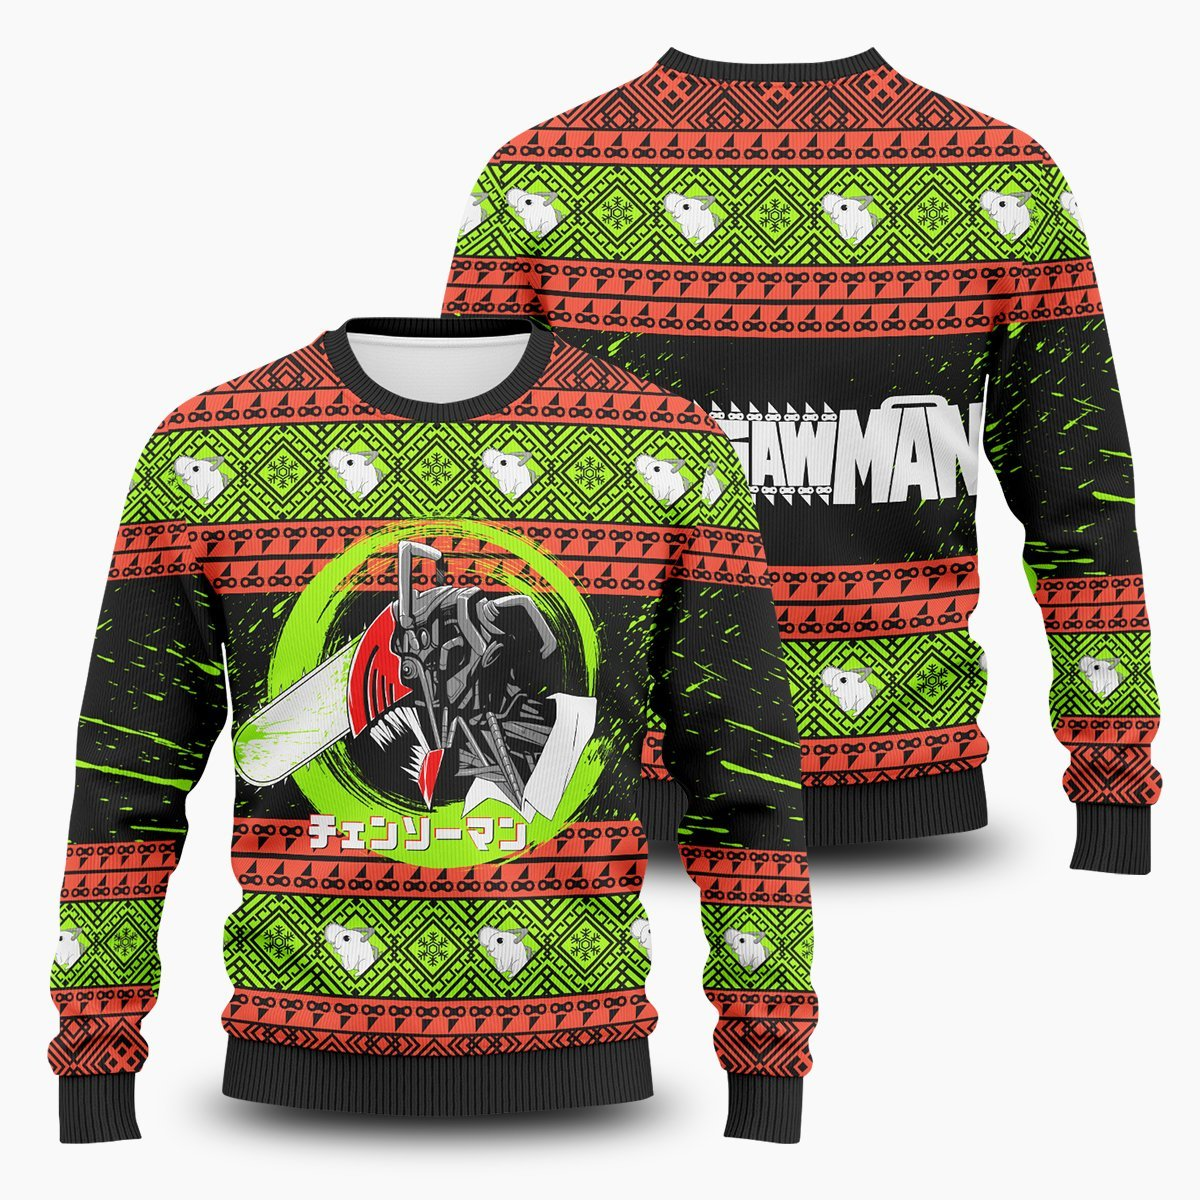 Chainsawman Xmas Unisex Wool Sweater FDM0310 S Official Otaku Treat Merch